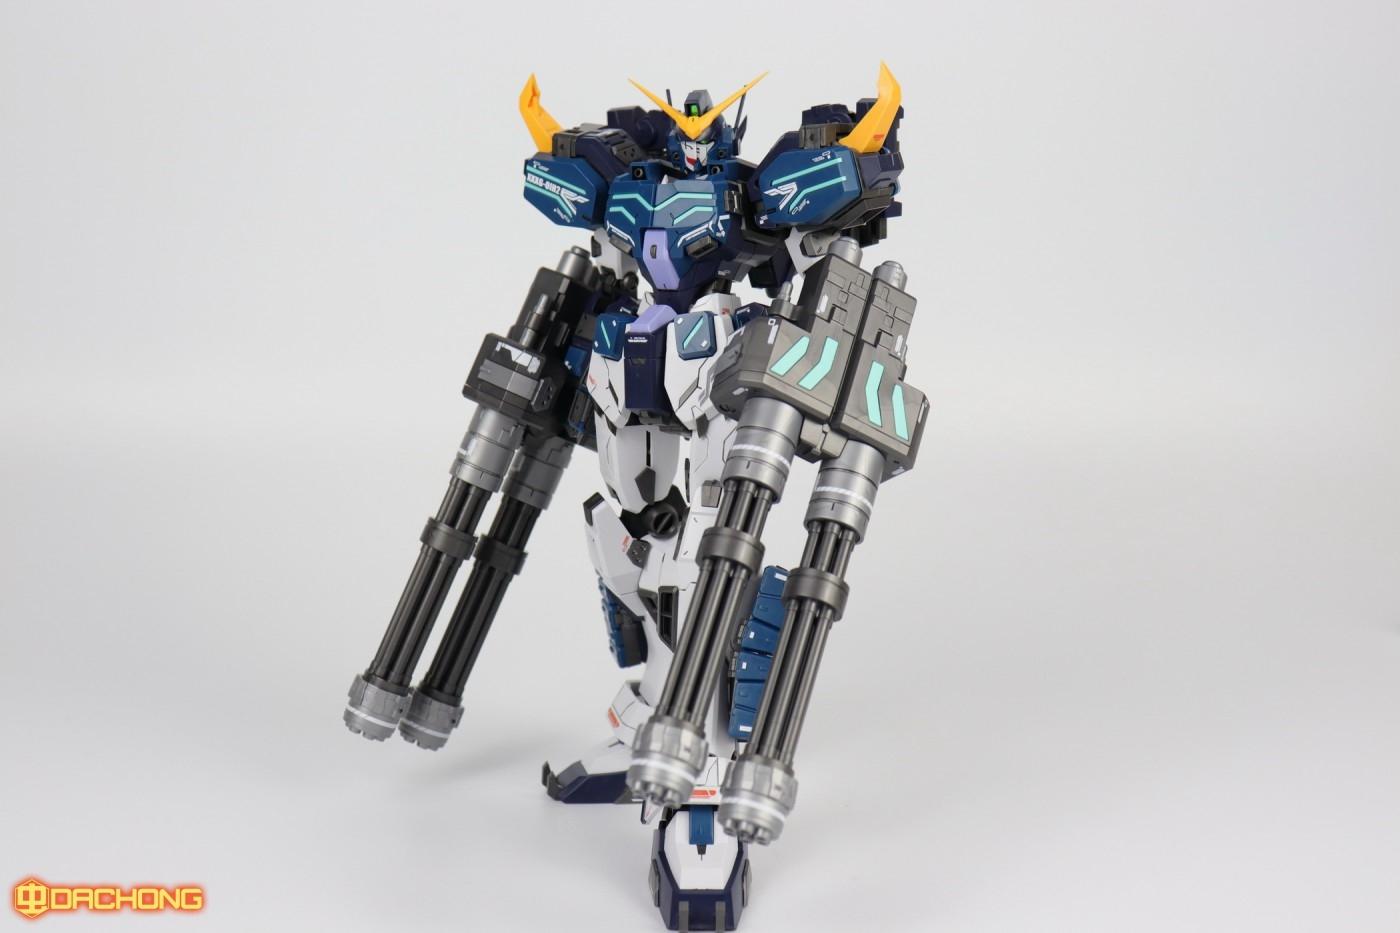 S296_MG_heavy_106.jpg